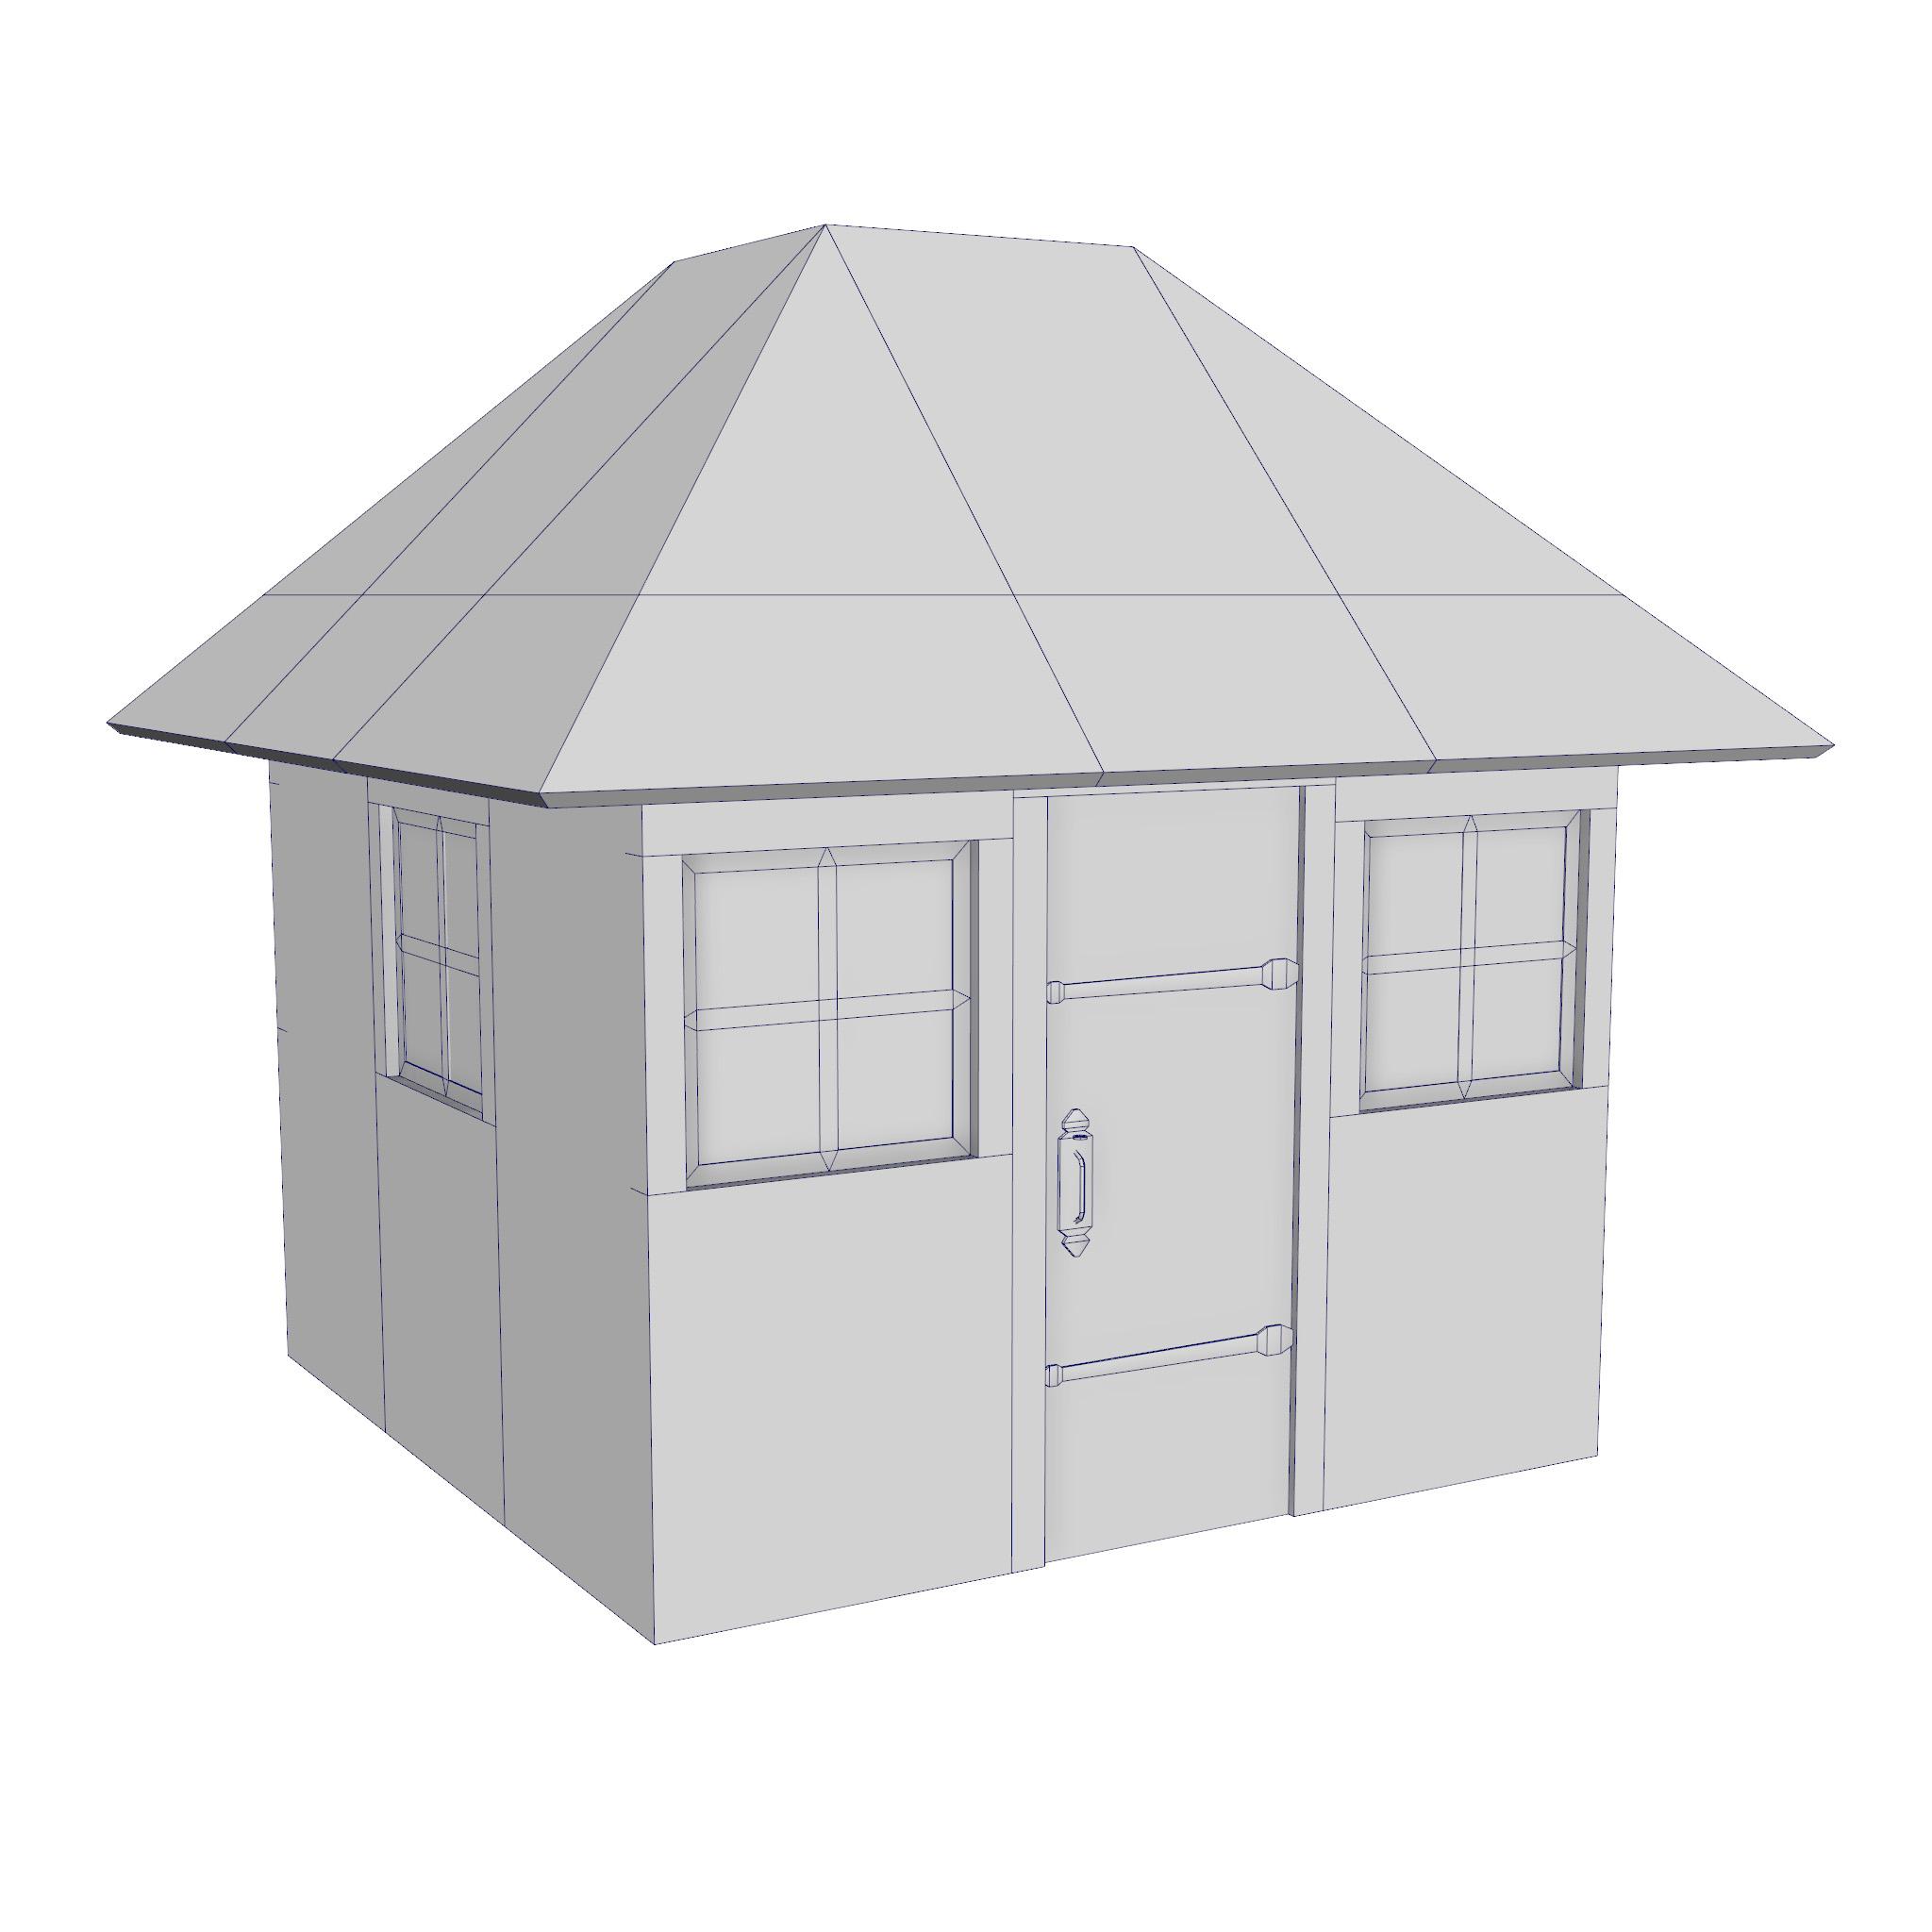 modular brick house set 3d model fbx ma mb 271419